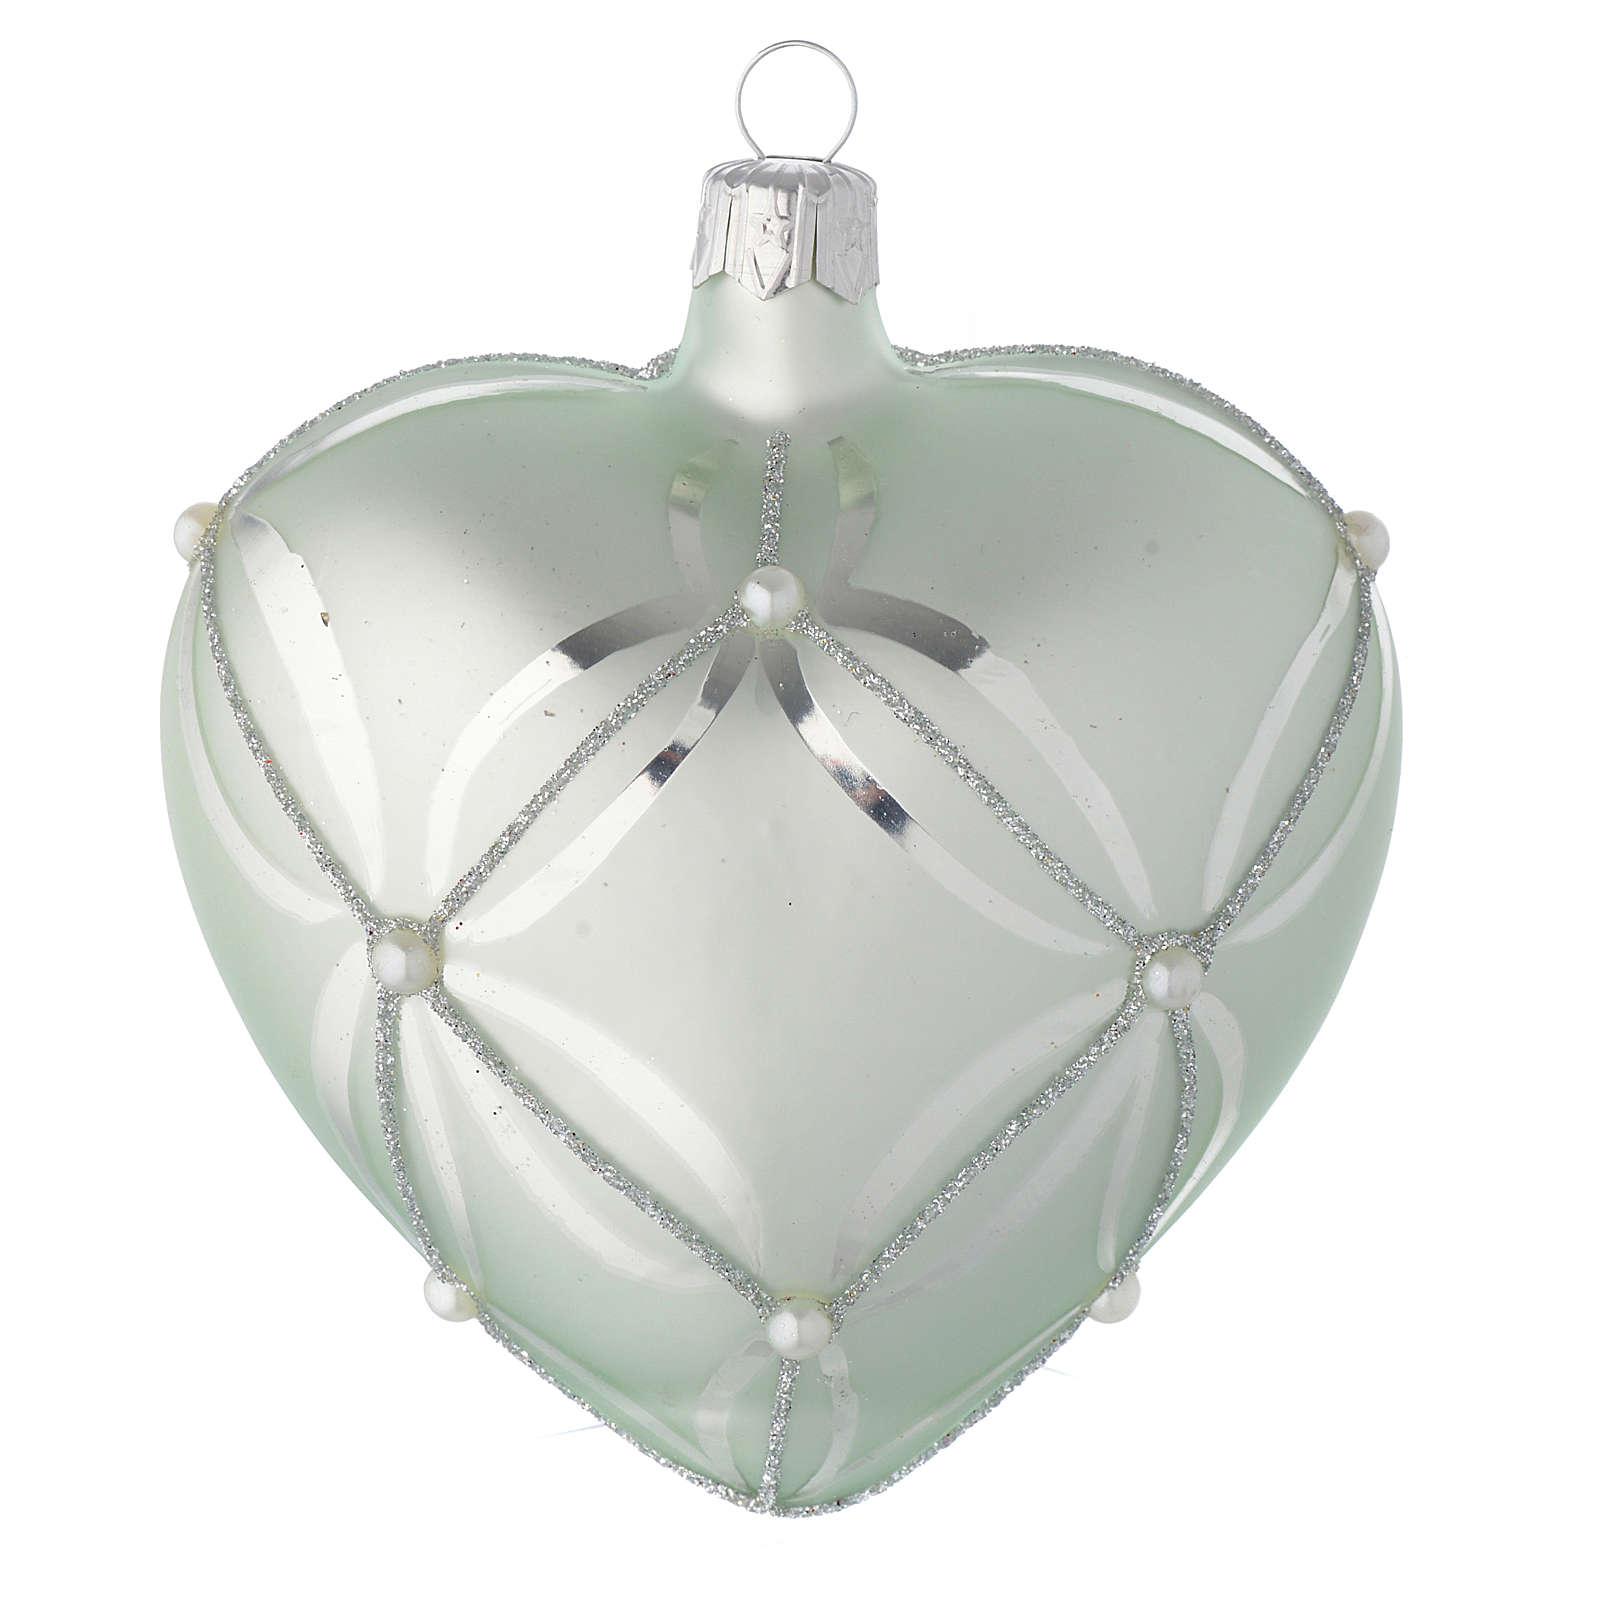 Coeur verre vert métallisé 100 mm 4